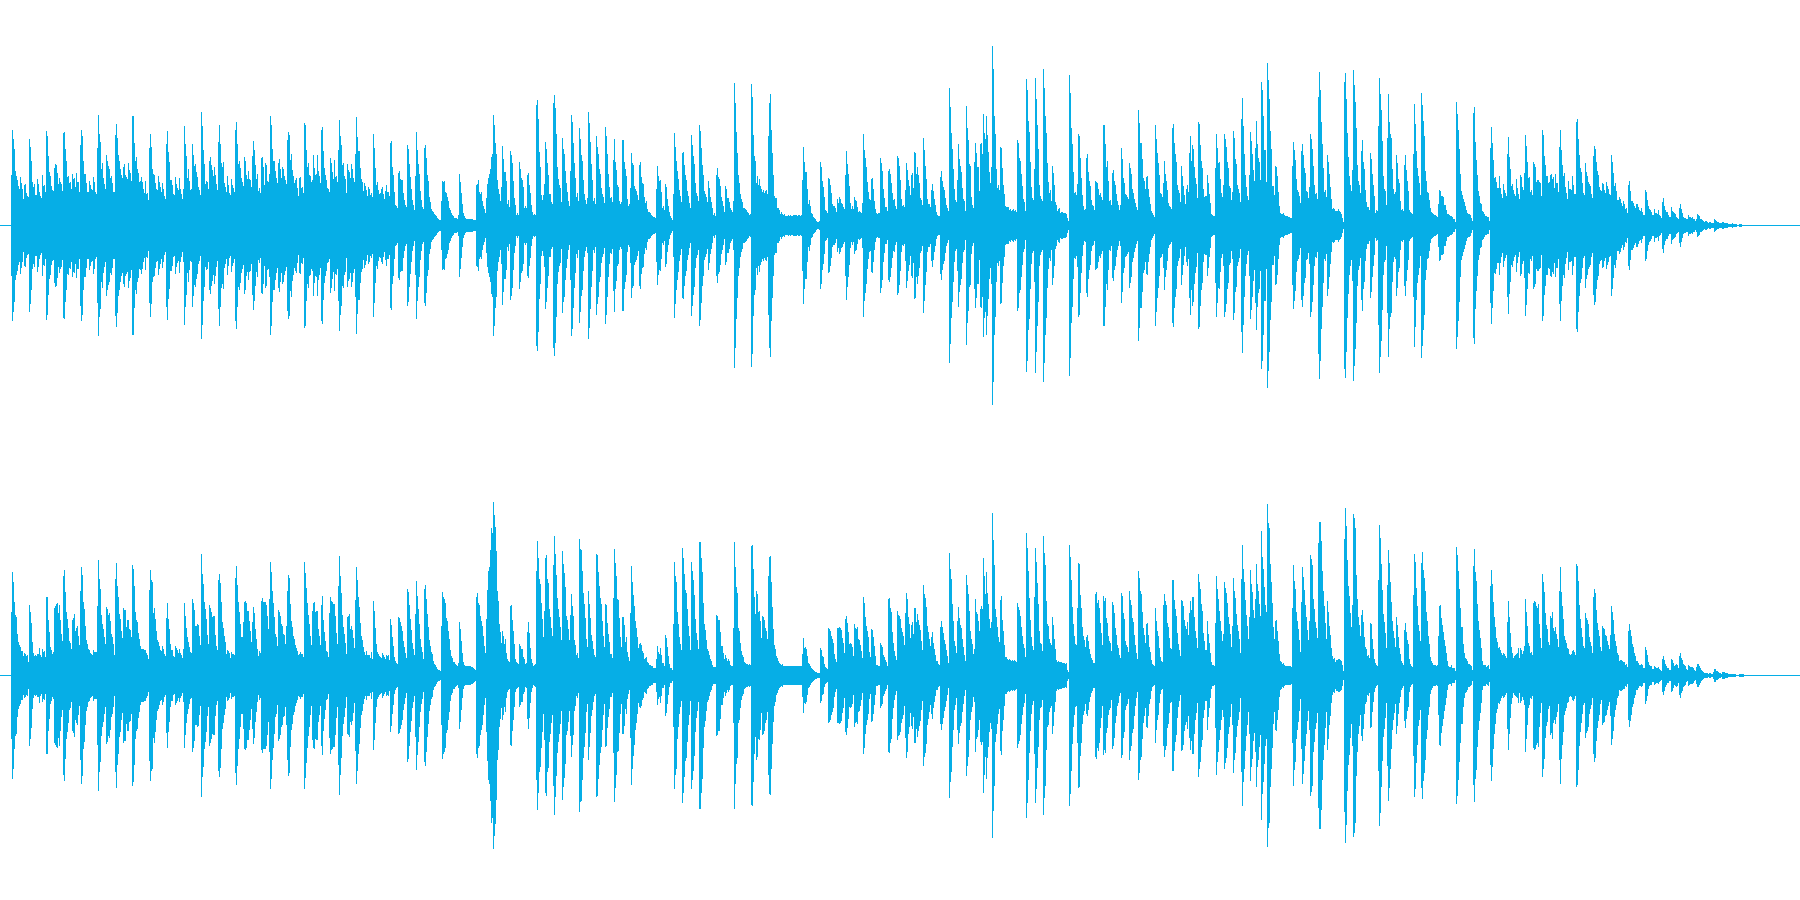 8bit -亡き王女のためのパヴァーヌ-の再生済みの波形